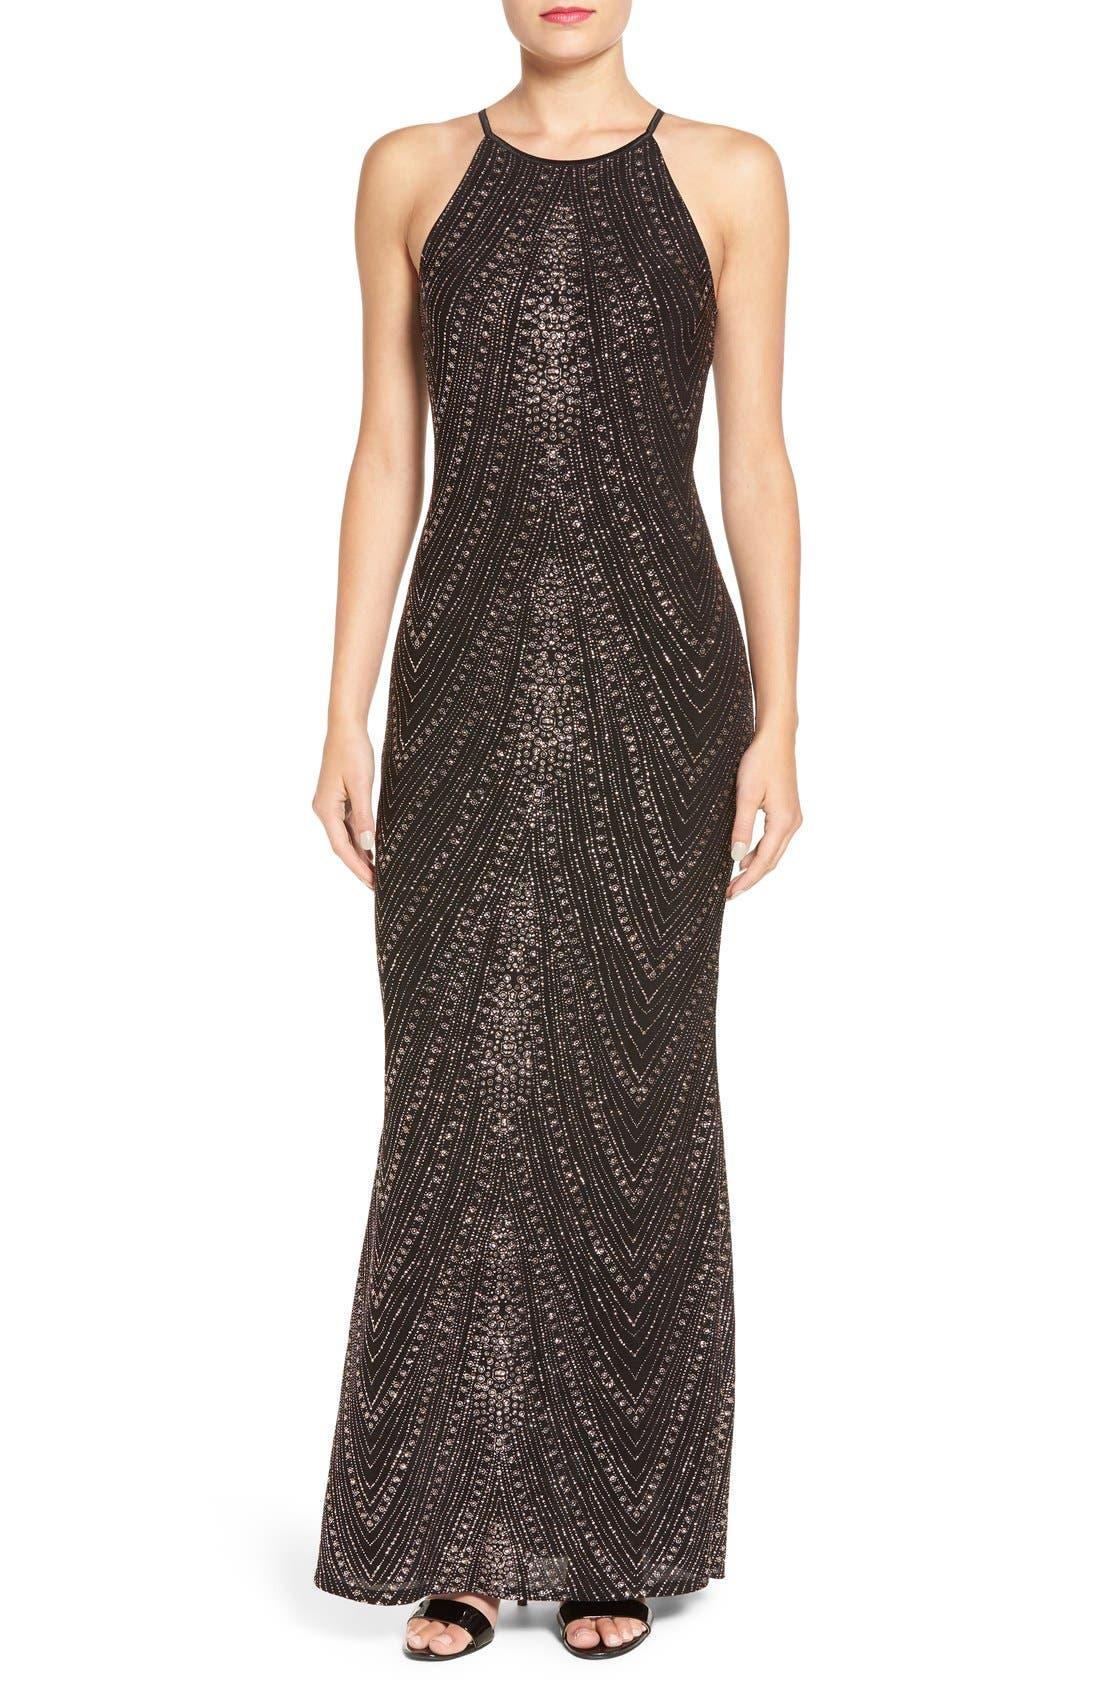 Main Image - Jump Apparel High Neck Glitter Gown